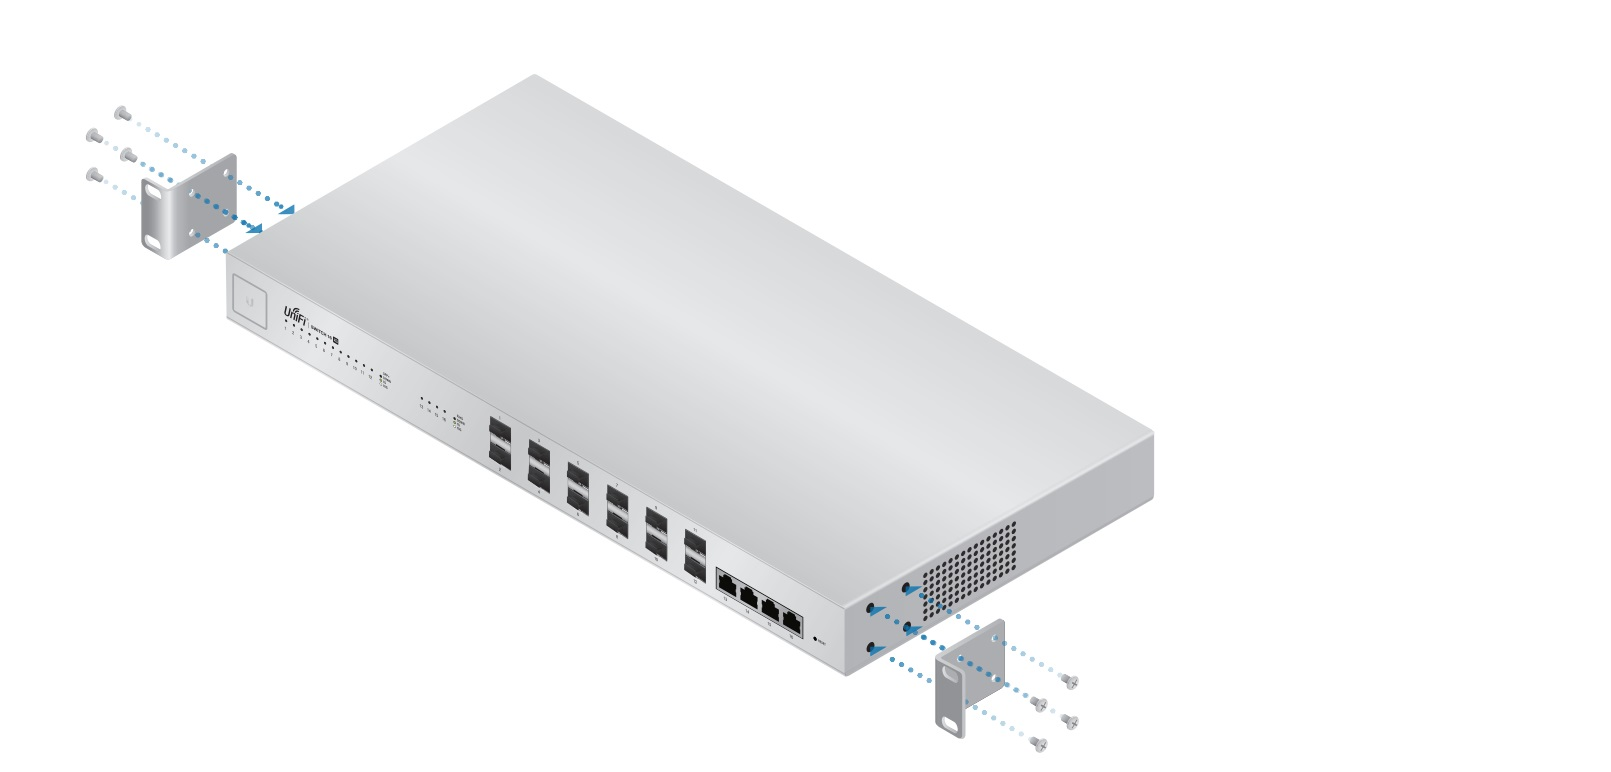 Ubiquiti UniFi Switch, US-16-XG, 12xSFP+, 4x10G RJ45